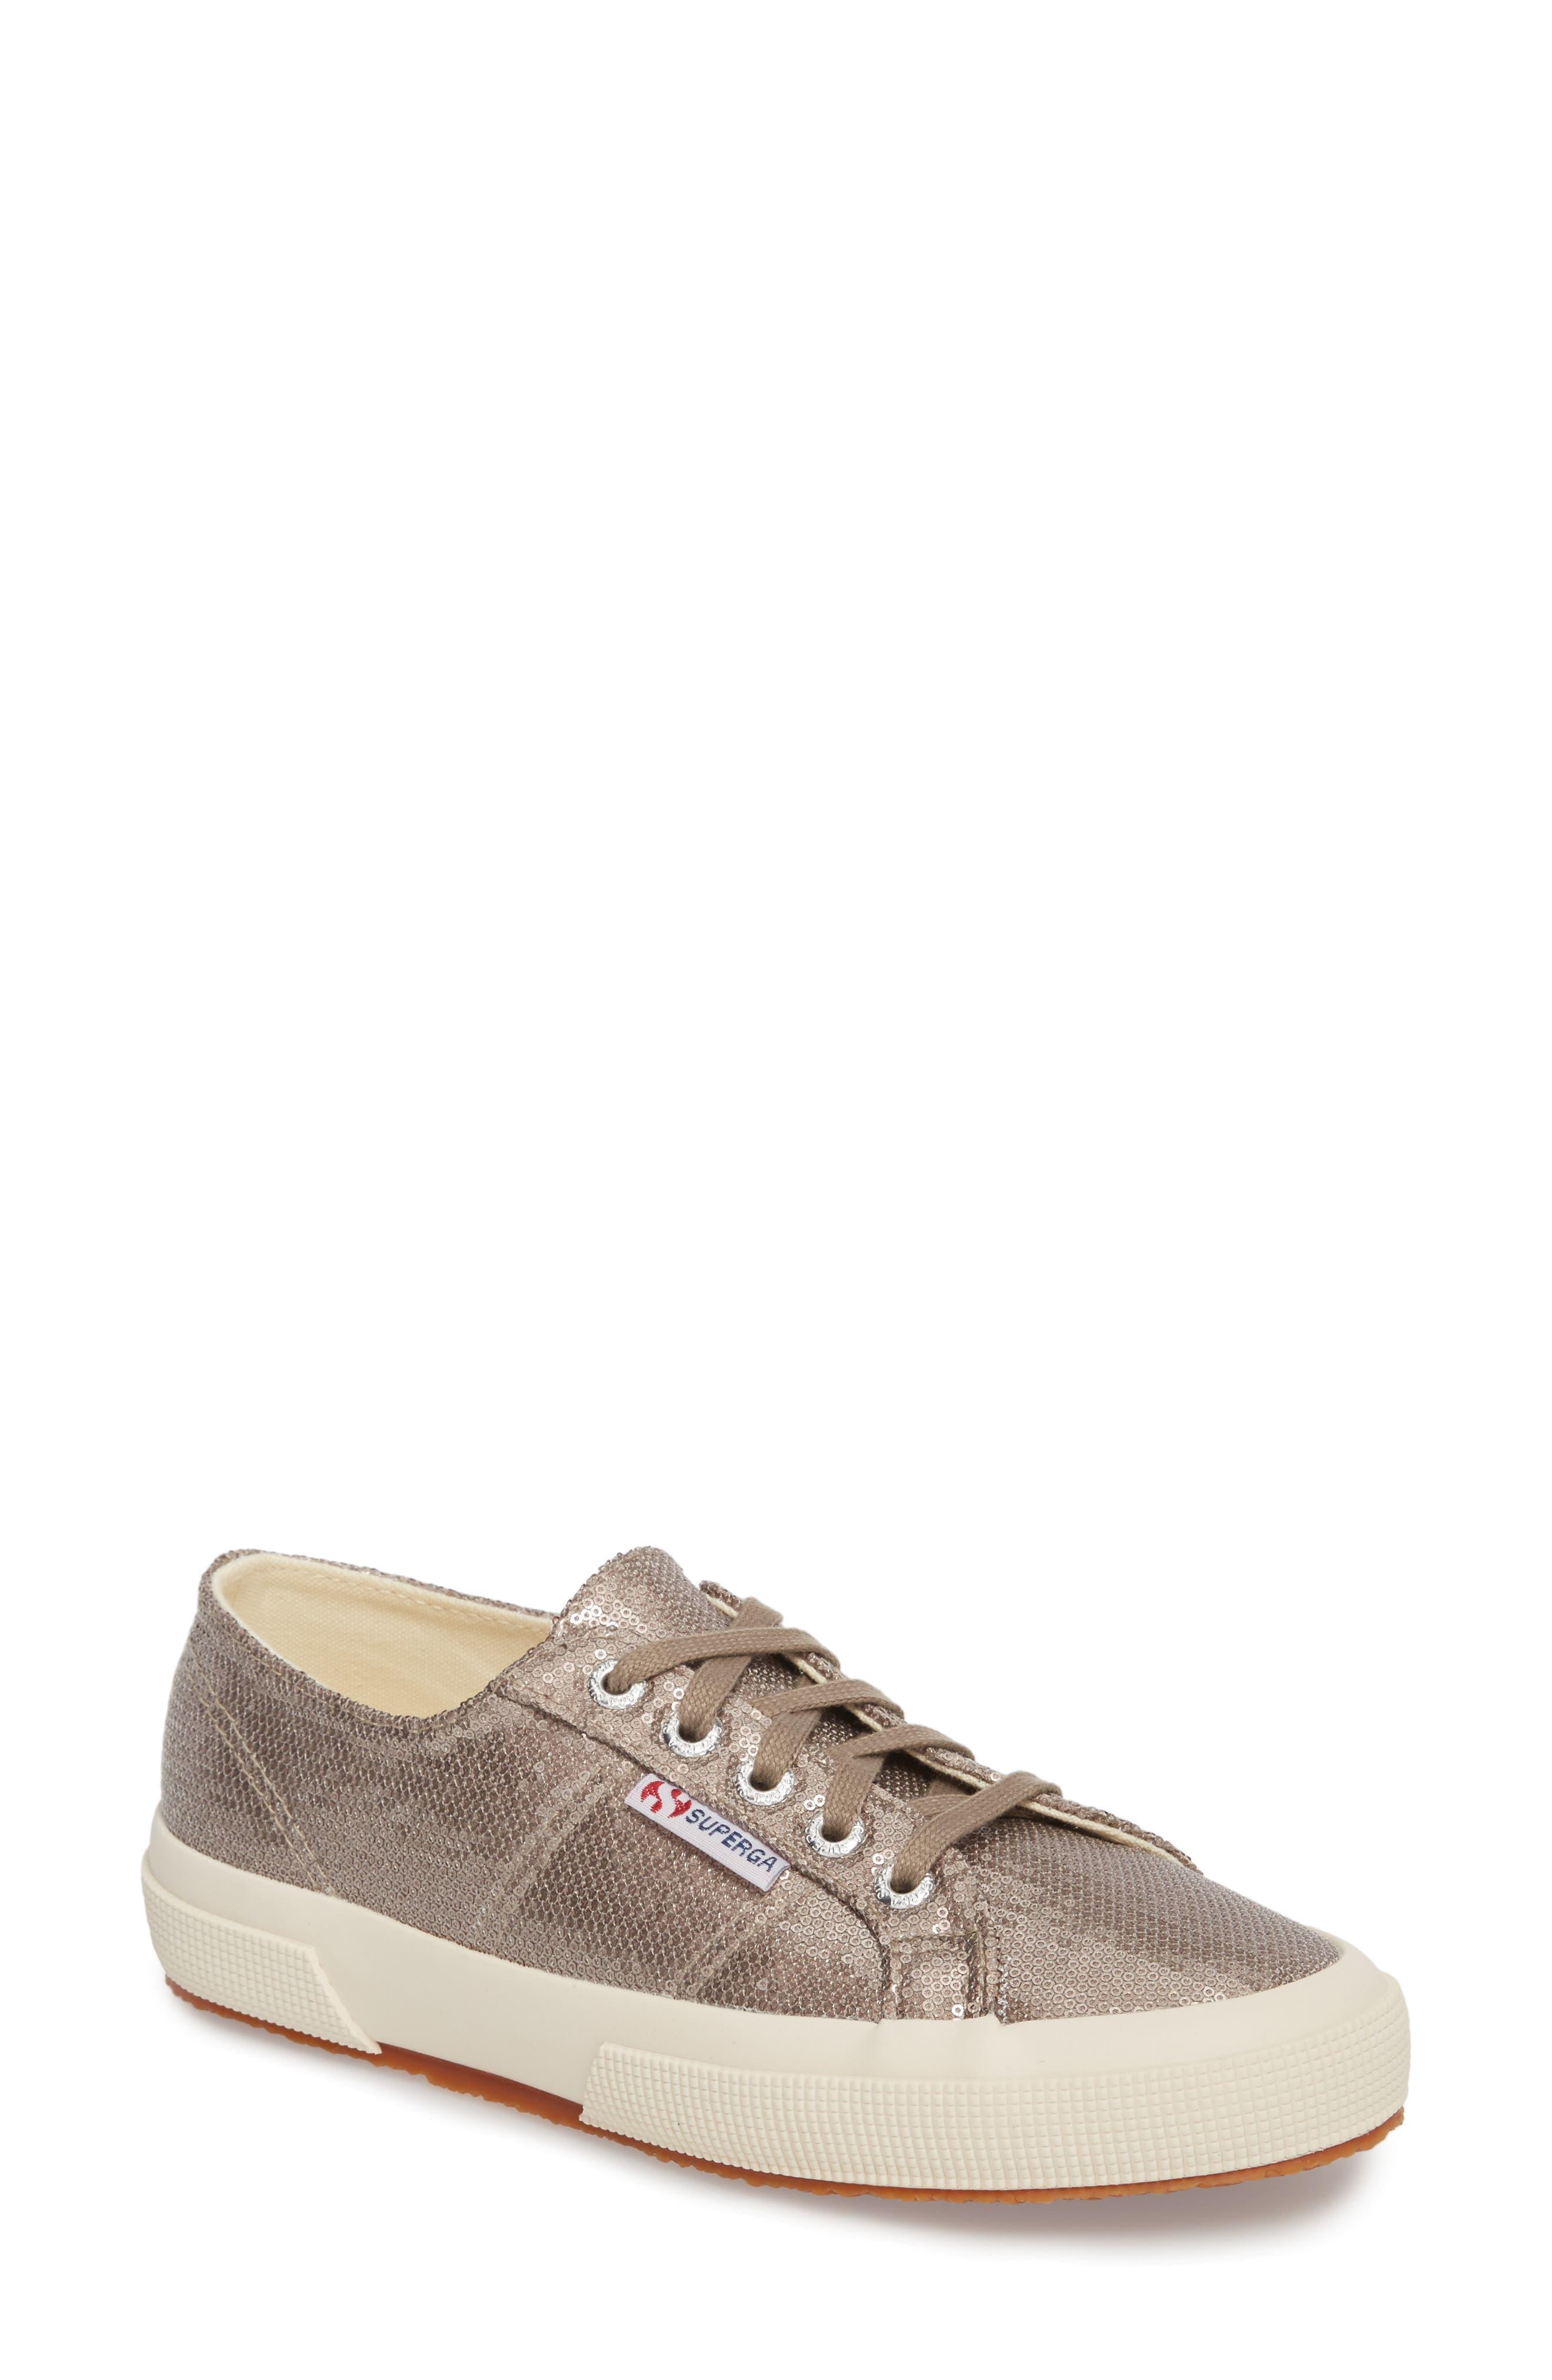 2750 Micro Sequin Sneaker,                         Main,                         color, 227